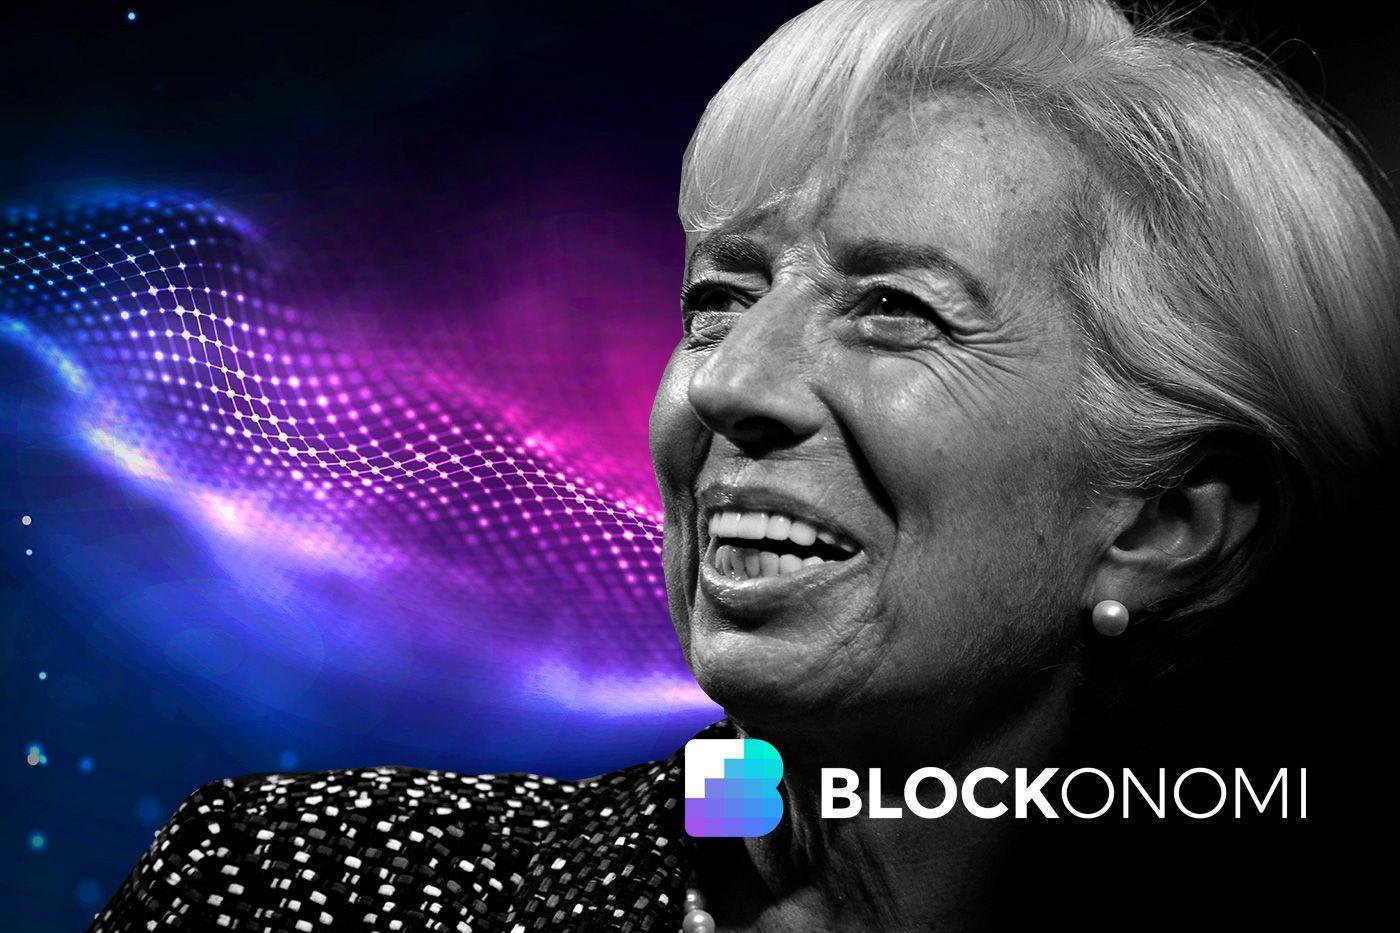 The World Bank Imf Joint Blockchain Network Cryptocurrency Https Blockonomi Com World Bank Imf Private B Cryptocurrency Blockchain Blockchain Technology